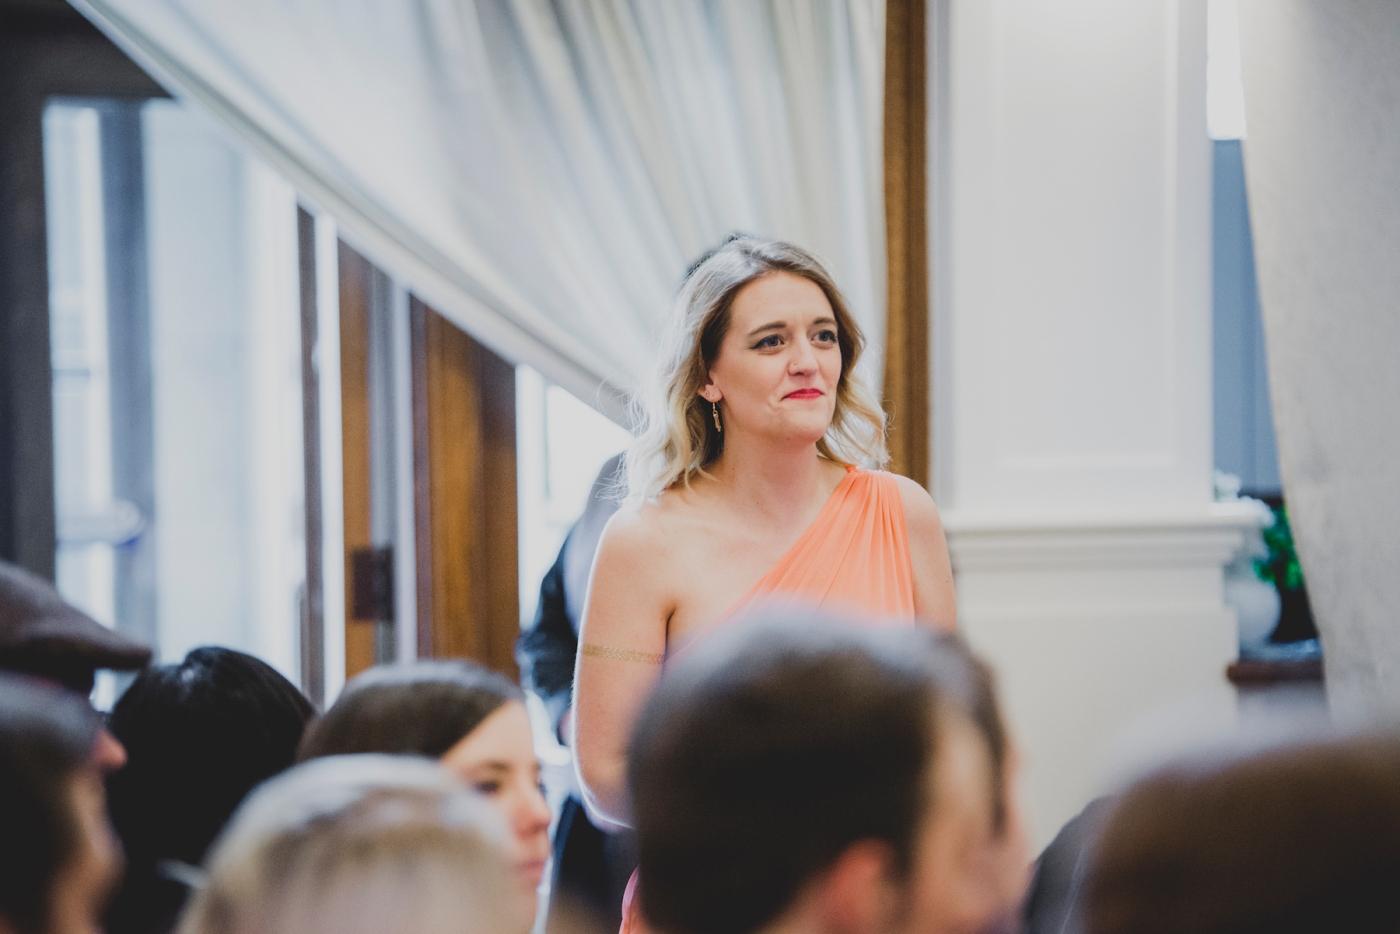 DSC_2542Everett_Wedding_Ballroom_Jane_Speleers_photography_Rachel_and_Edmund_Ceremony_2017